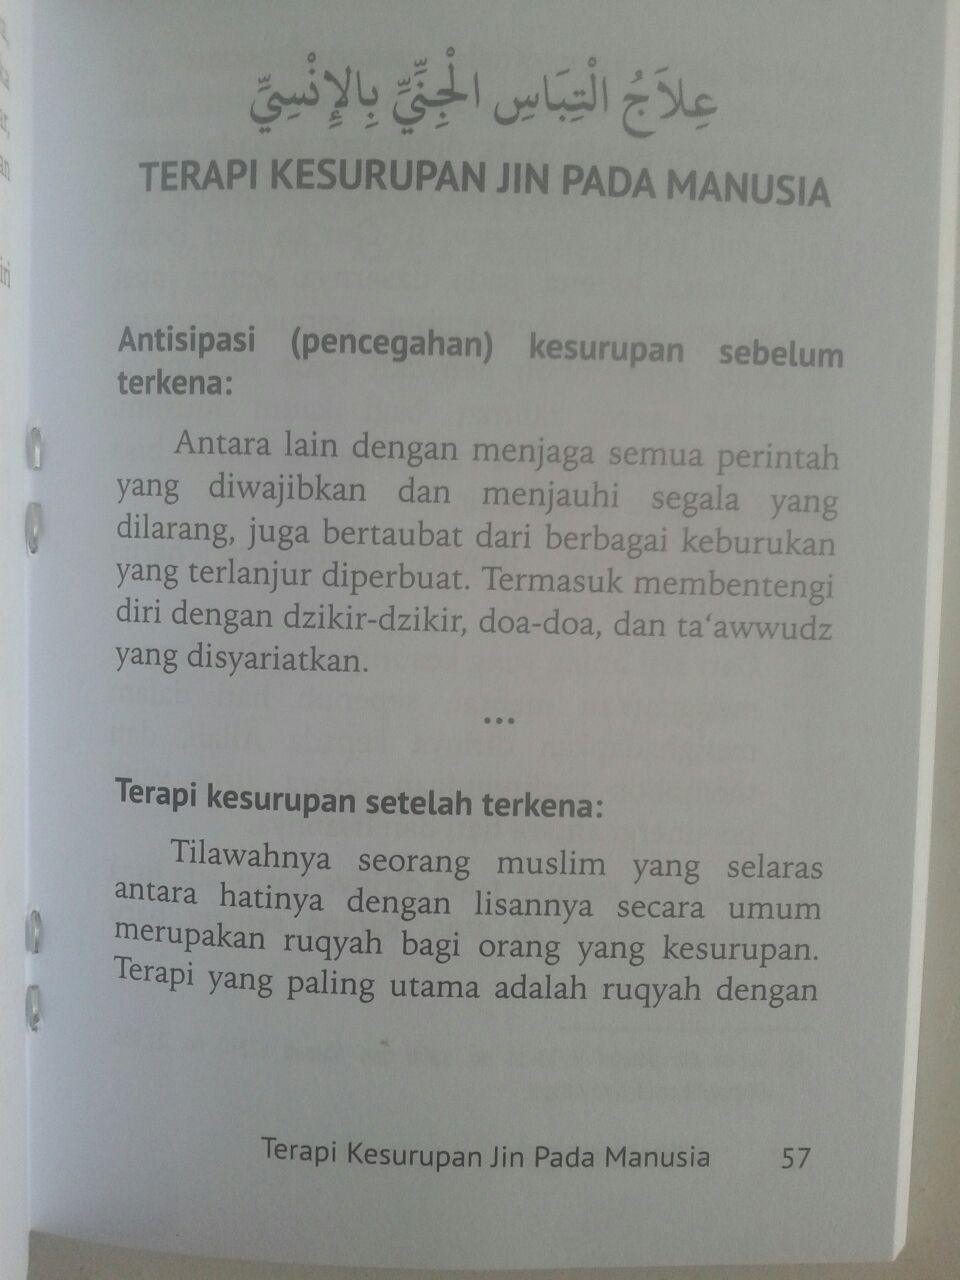 Buku Saku Terapi Ruqyah Menurut Al-Qur'an Dan As-Sunnah isi